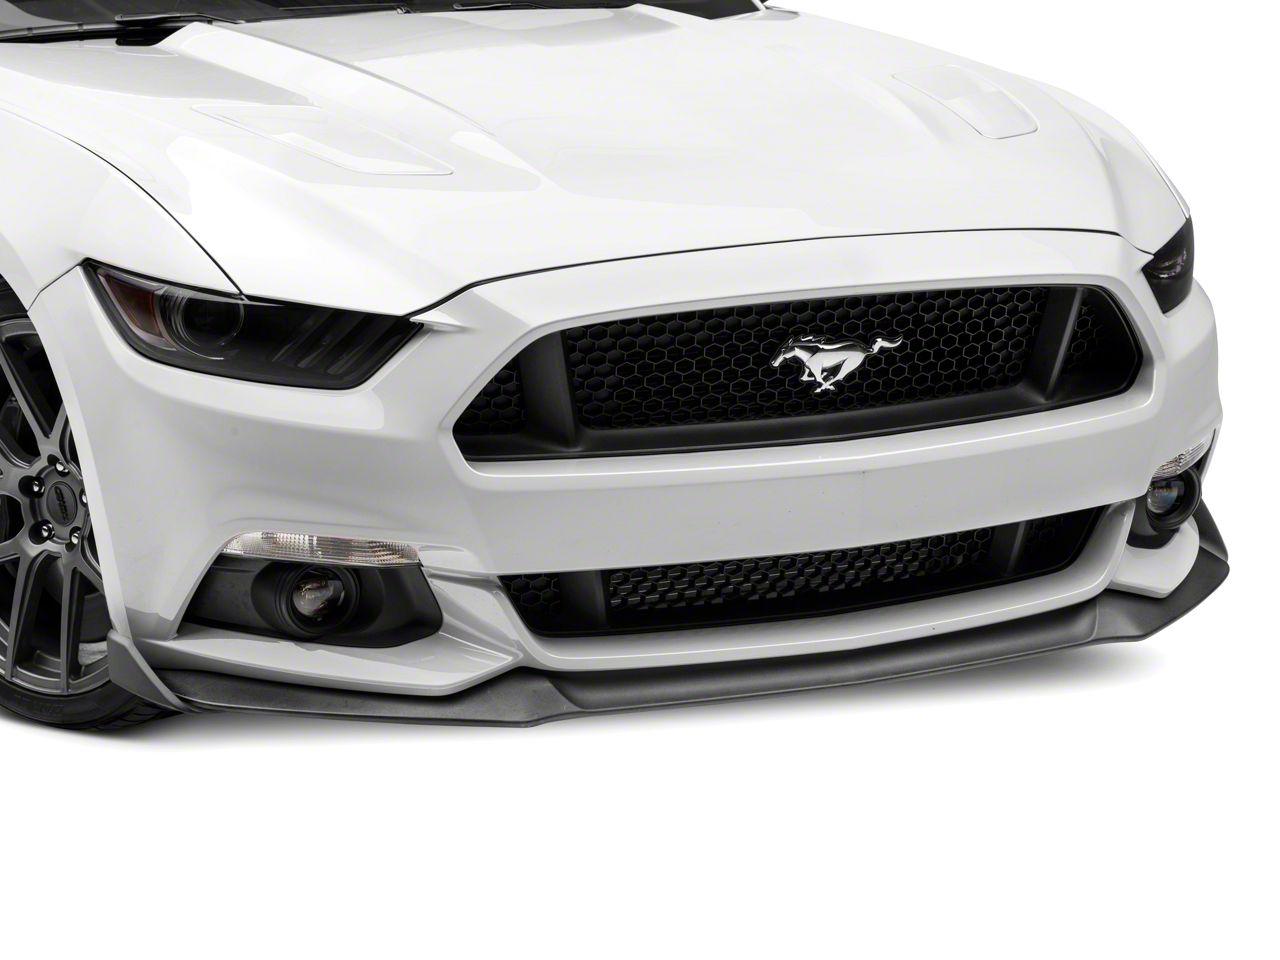 Add MMD Chin Spoiler Winglets (15-17 GT, EcoBoost, V6)